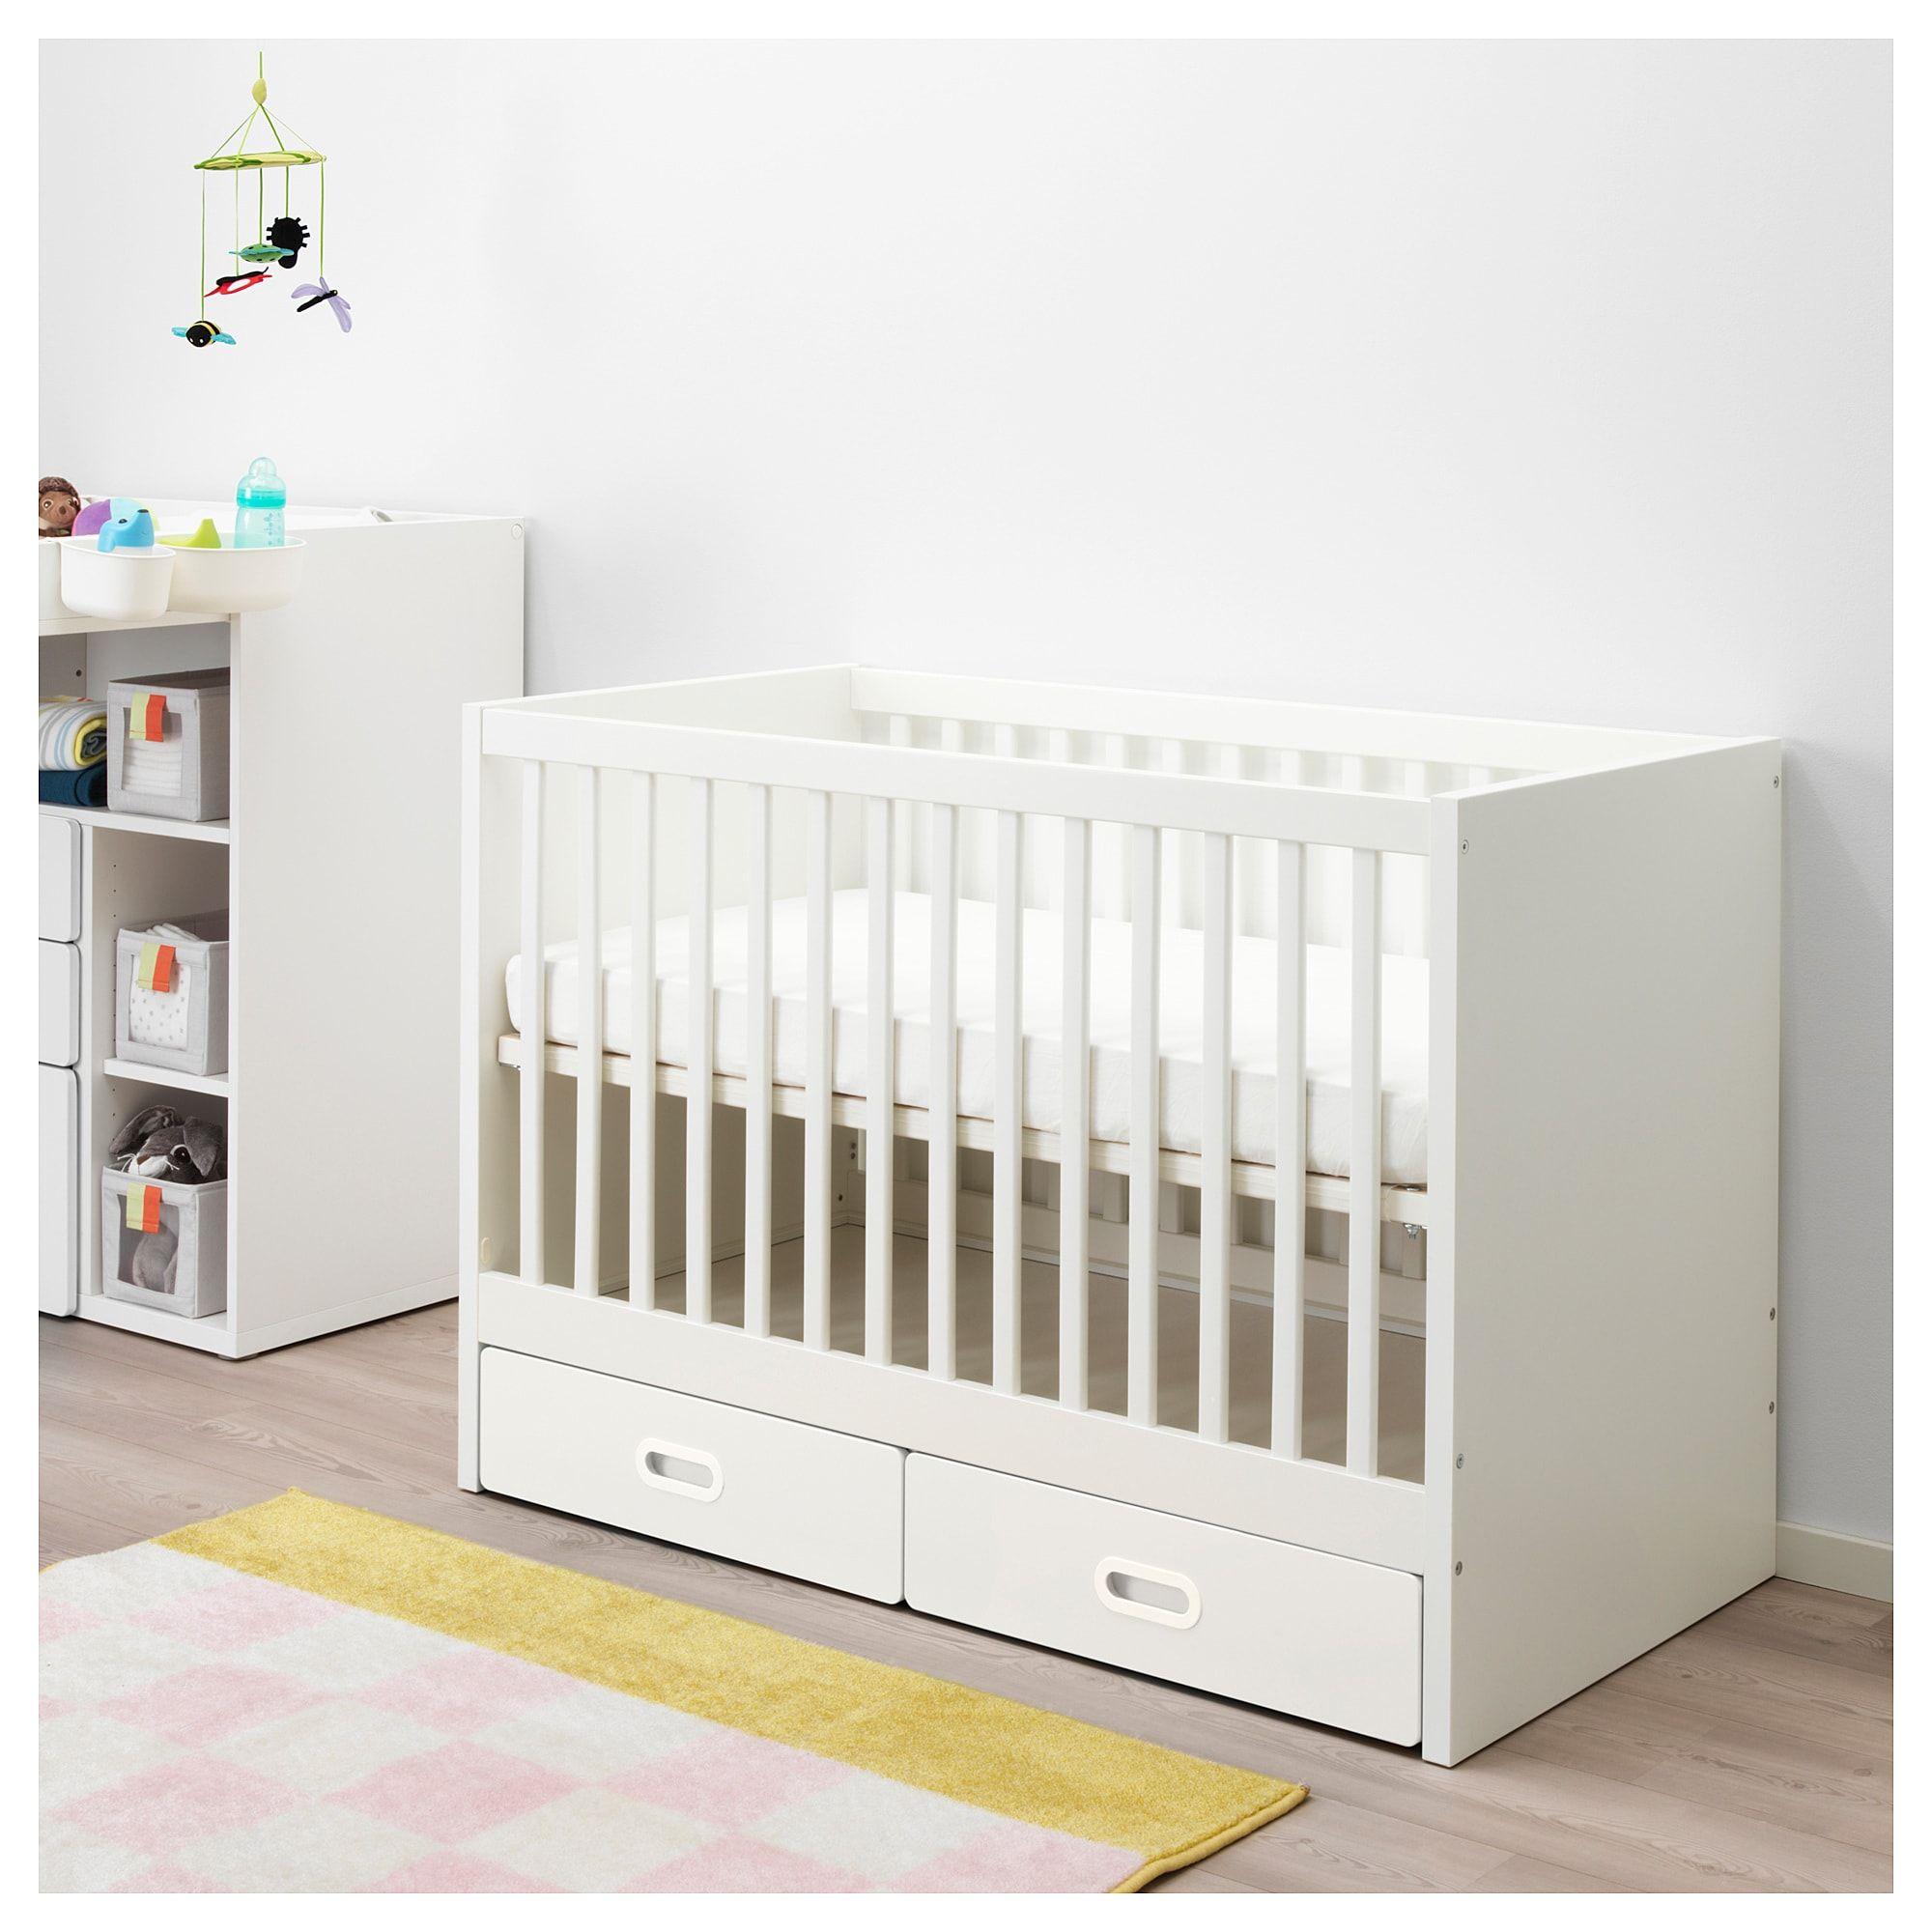 Stuva Fritids Babybedje Met Lades Wit Ikea En 2020 Lit Bebe Lit Bebe Ikea Lit Bebe Blanc